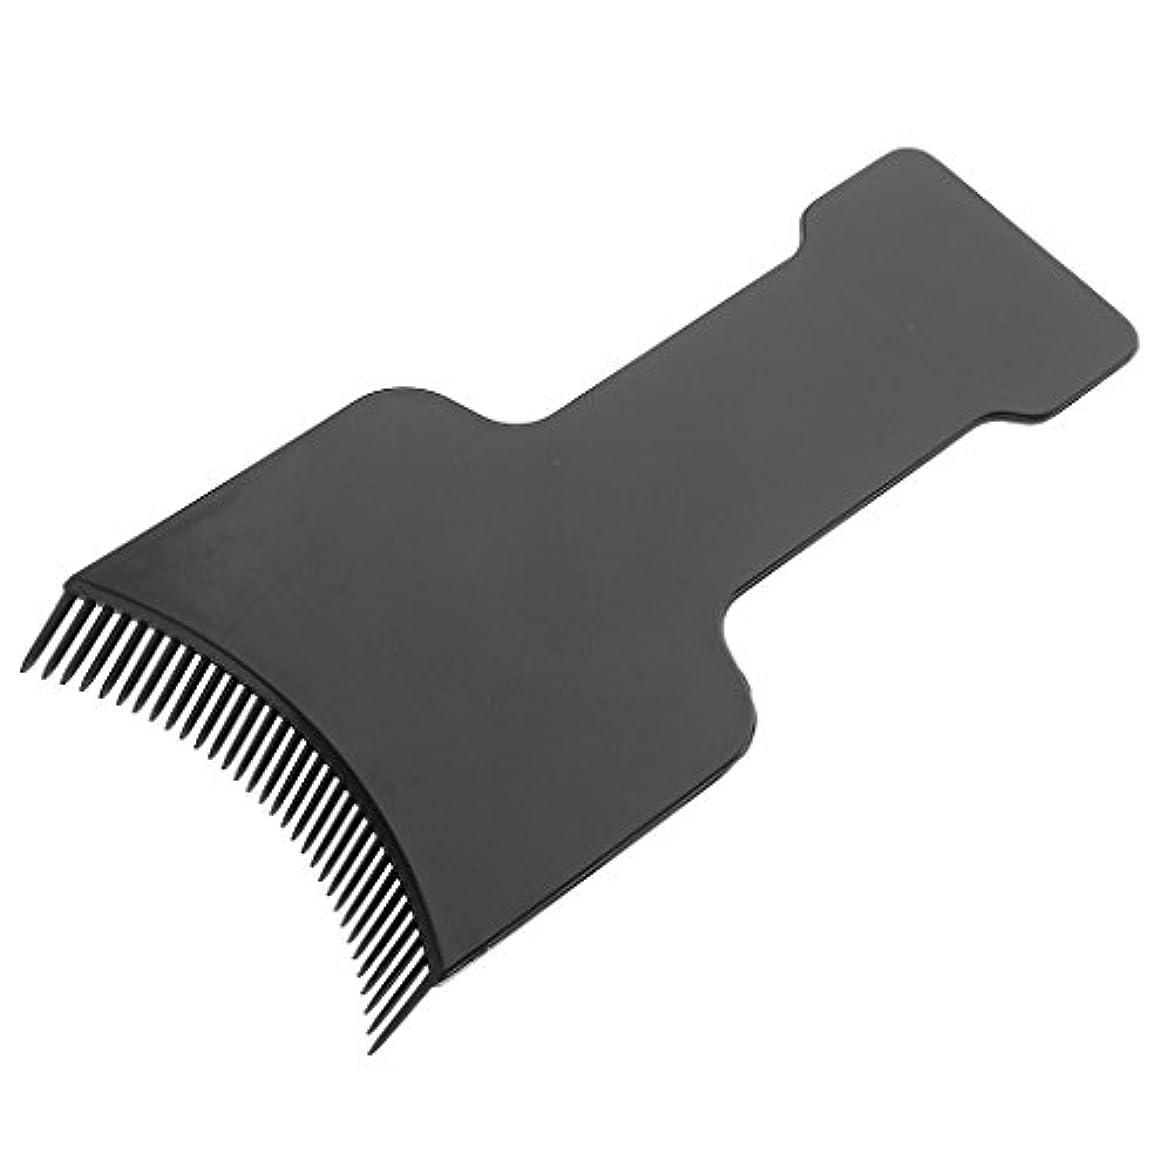 Fenteer ヘアカラー ボード 髪 染色 ツール ブラック 全4サイズ - S